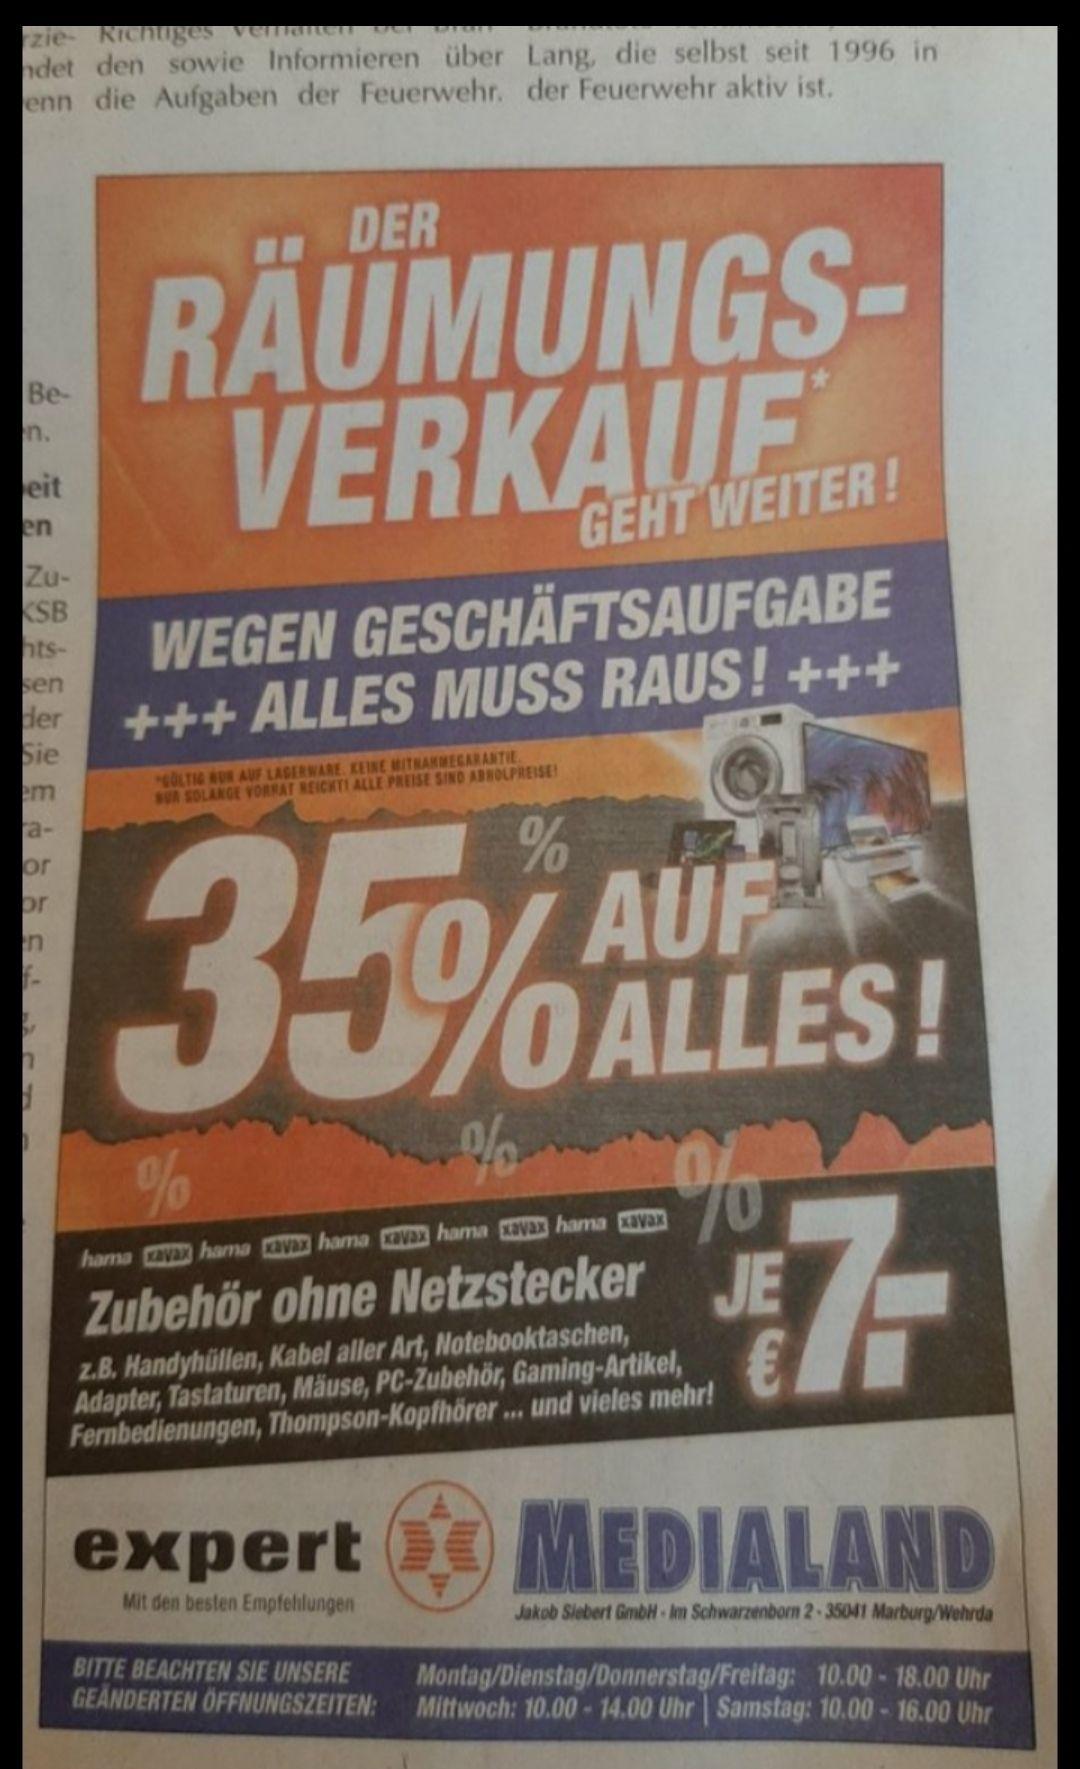 [Lokal Marburg] Expert MediaLand Räumungsverkauf - 35% auf alles